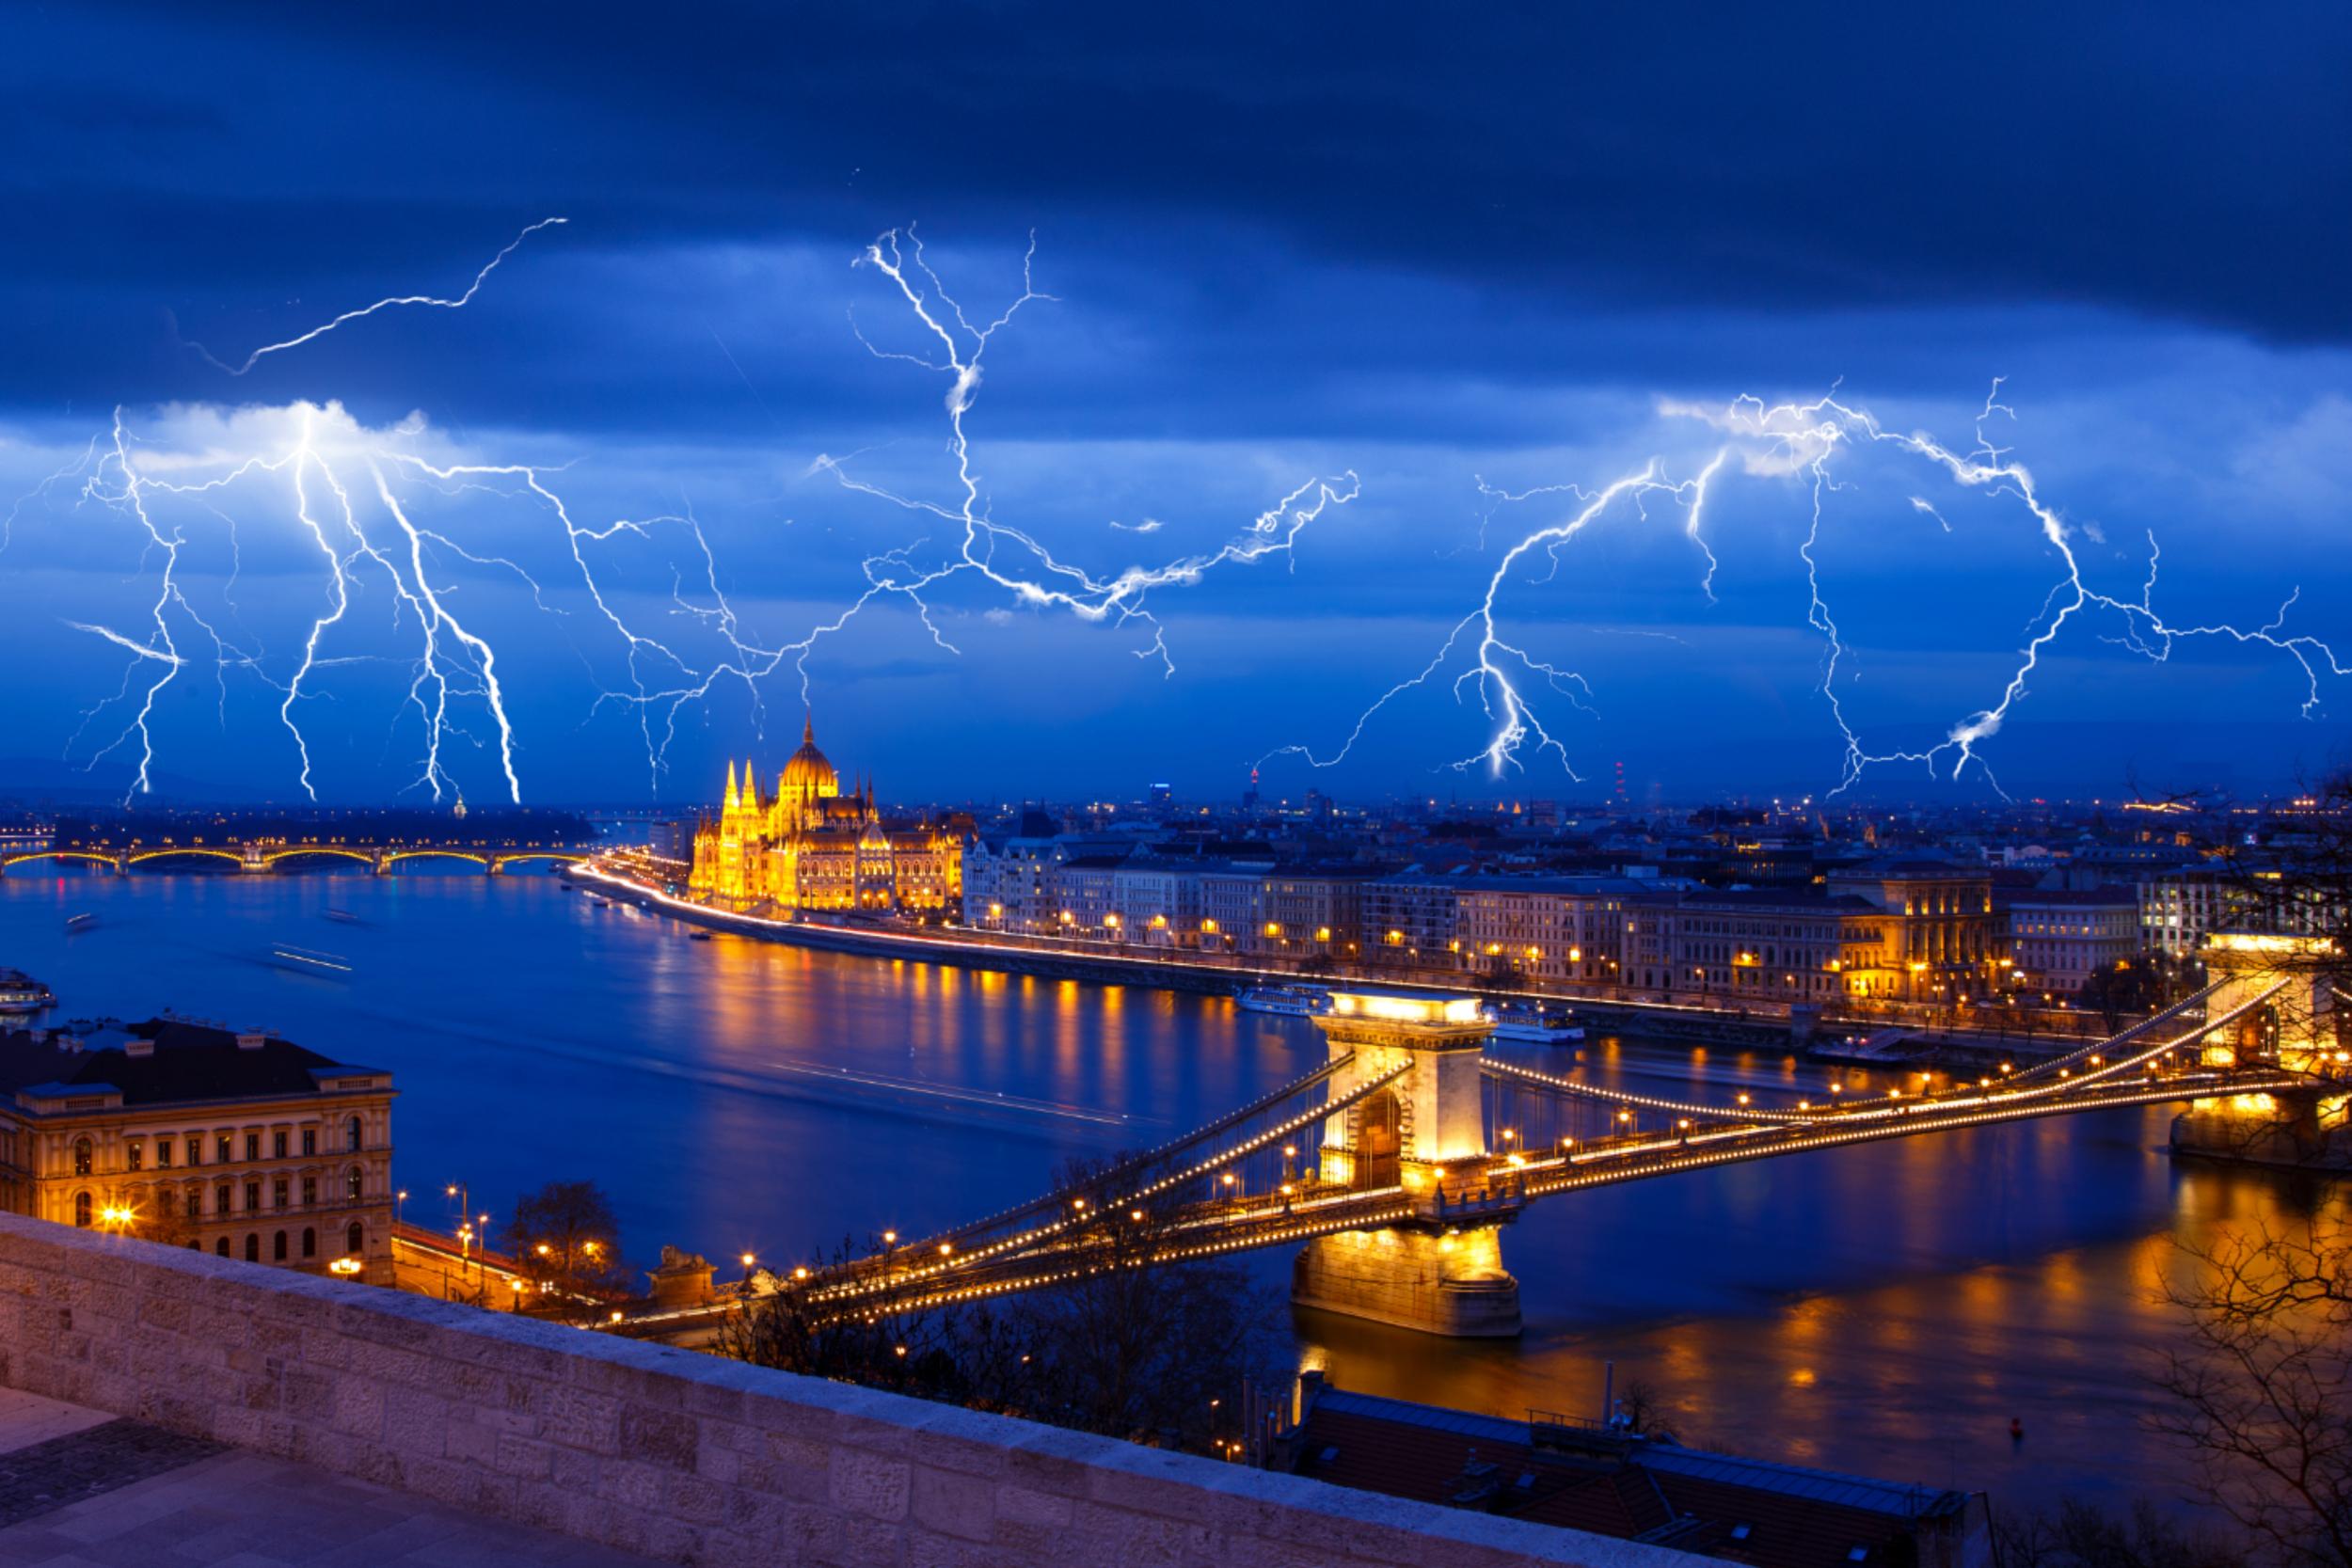 igy-keruld-el-vihar-villamlas-karokat